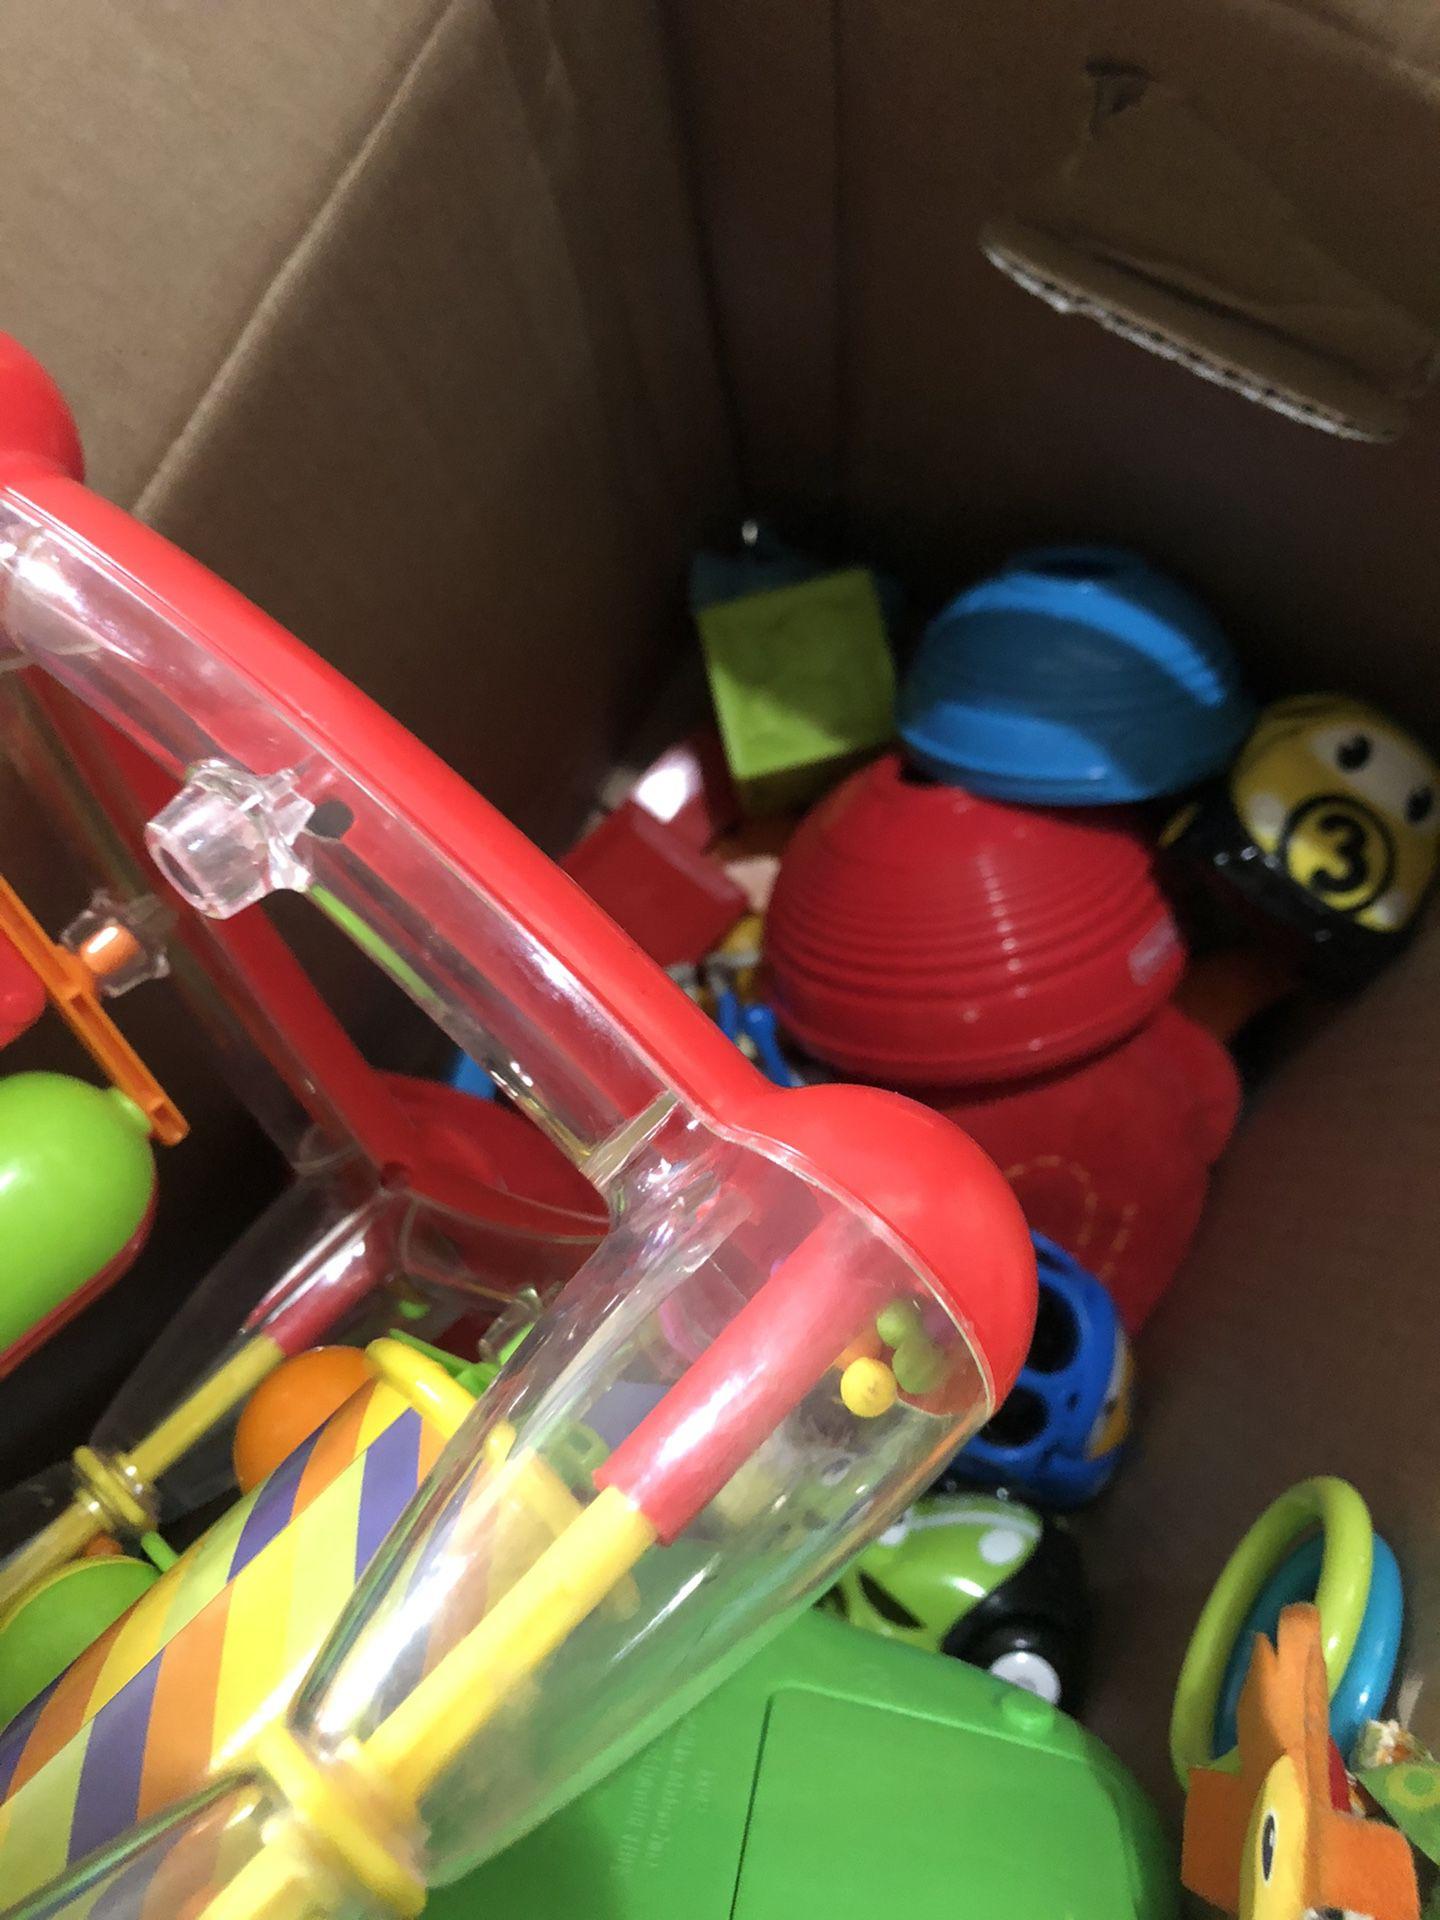 box of baby/toddler toys